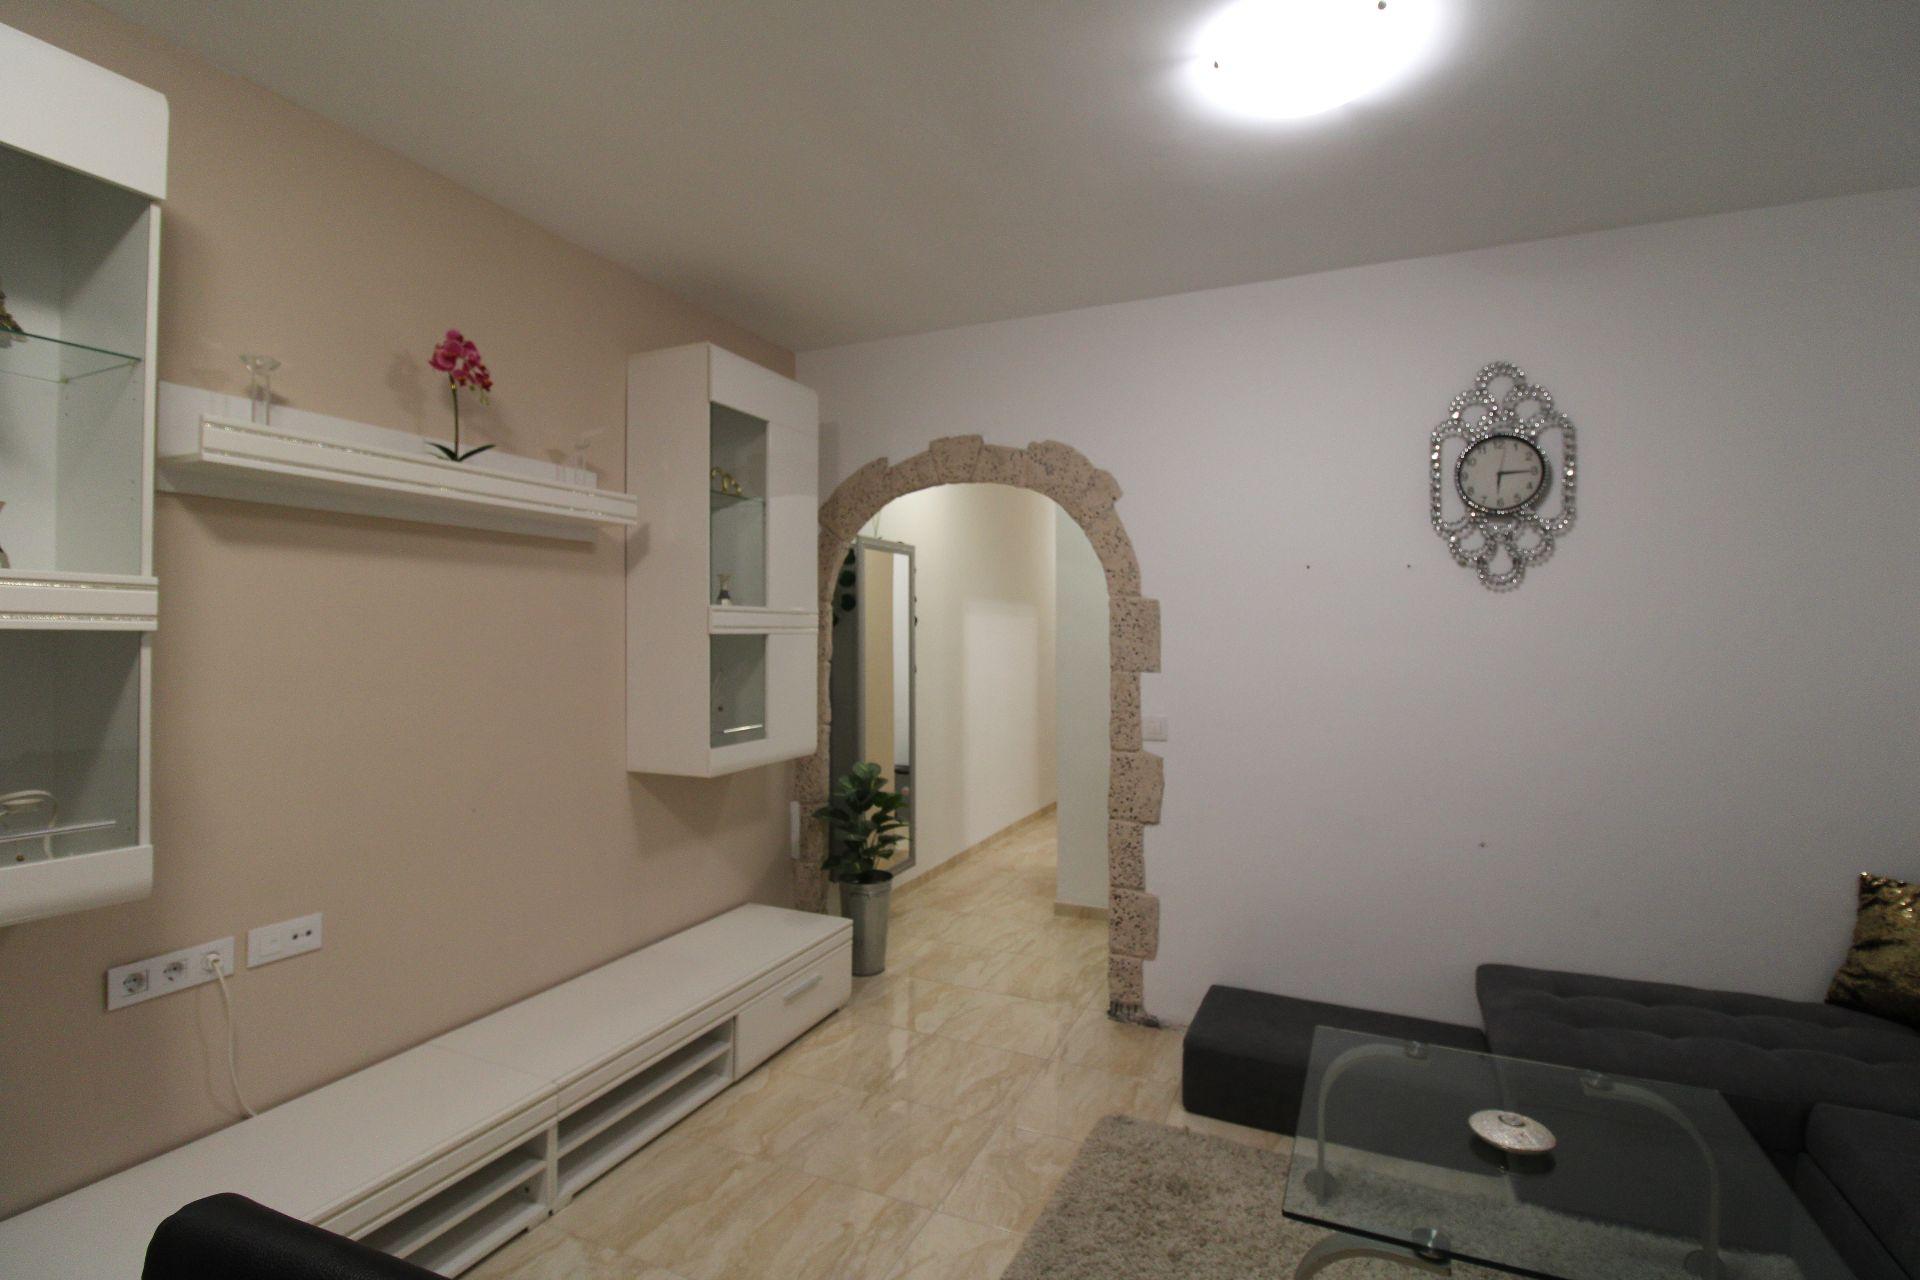 Miete Etagenwohnung in Sant Josep-Zona Hospital. Piso en alquiler  en san jose